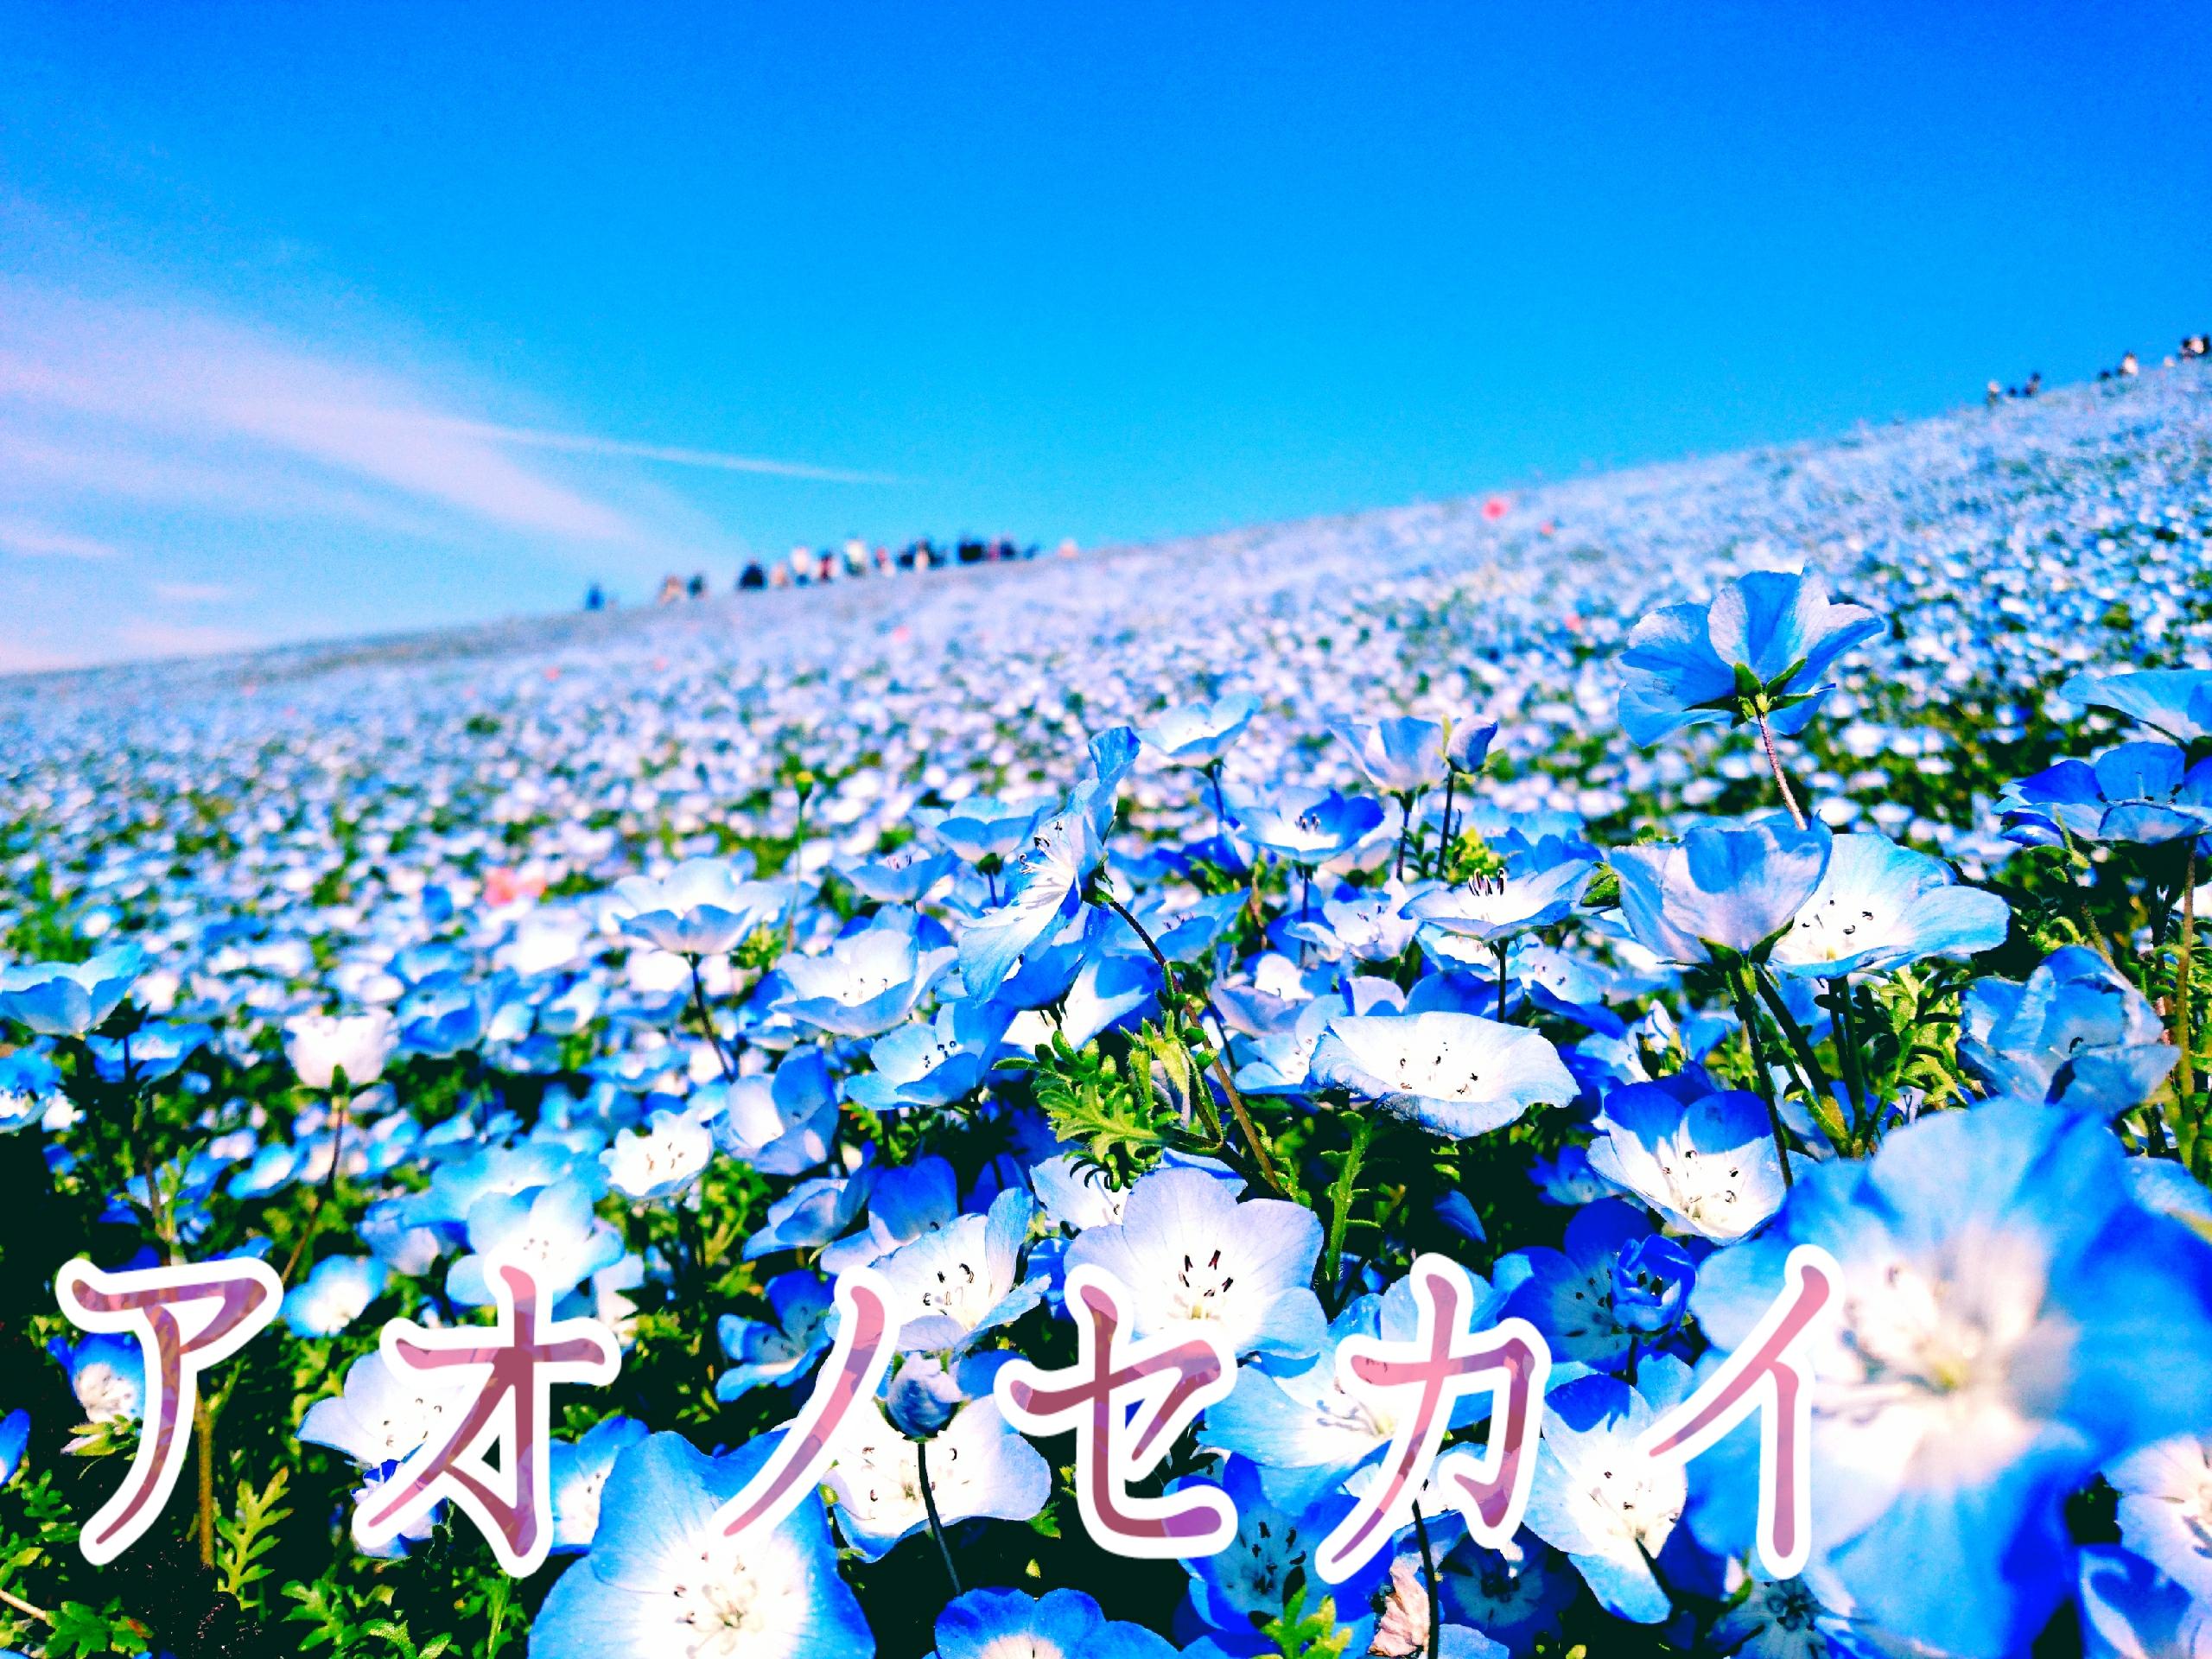 【GW】青の絶景!!ネモフィラを見に茨城へ♡